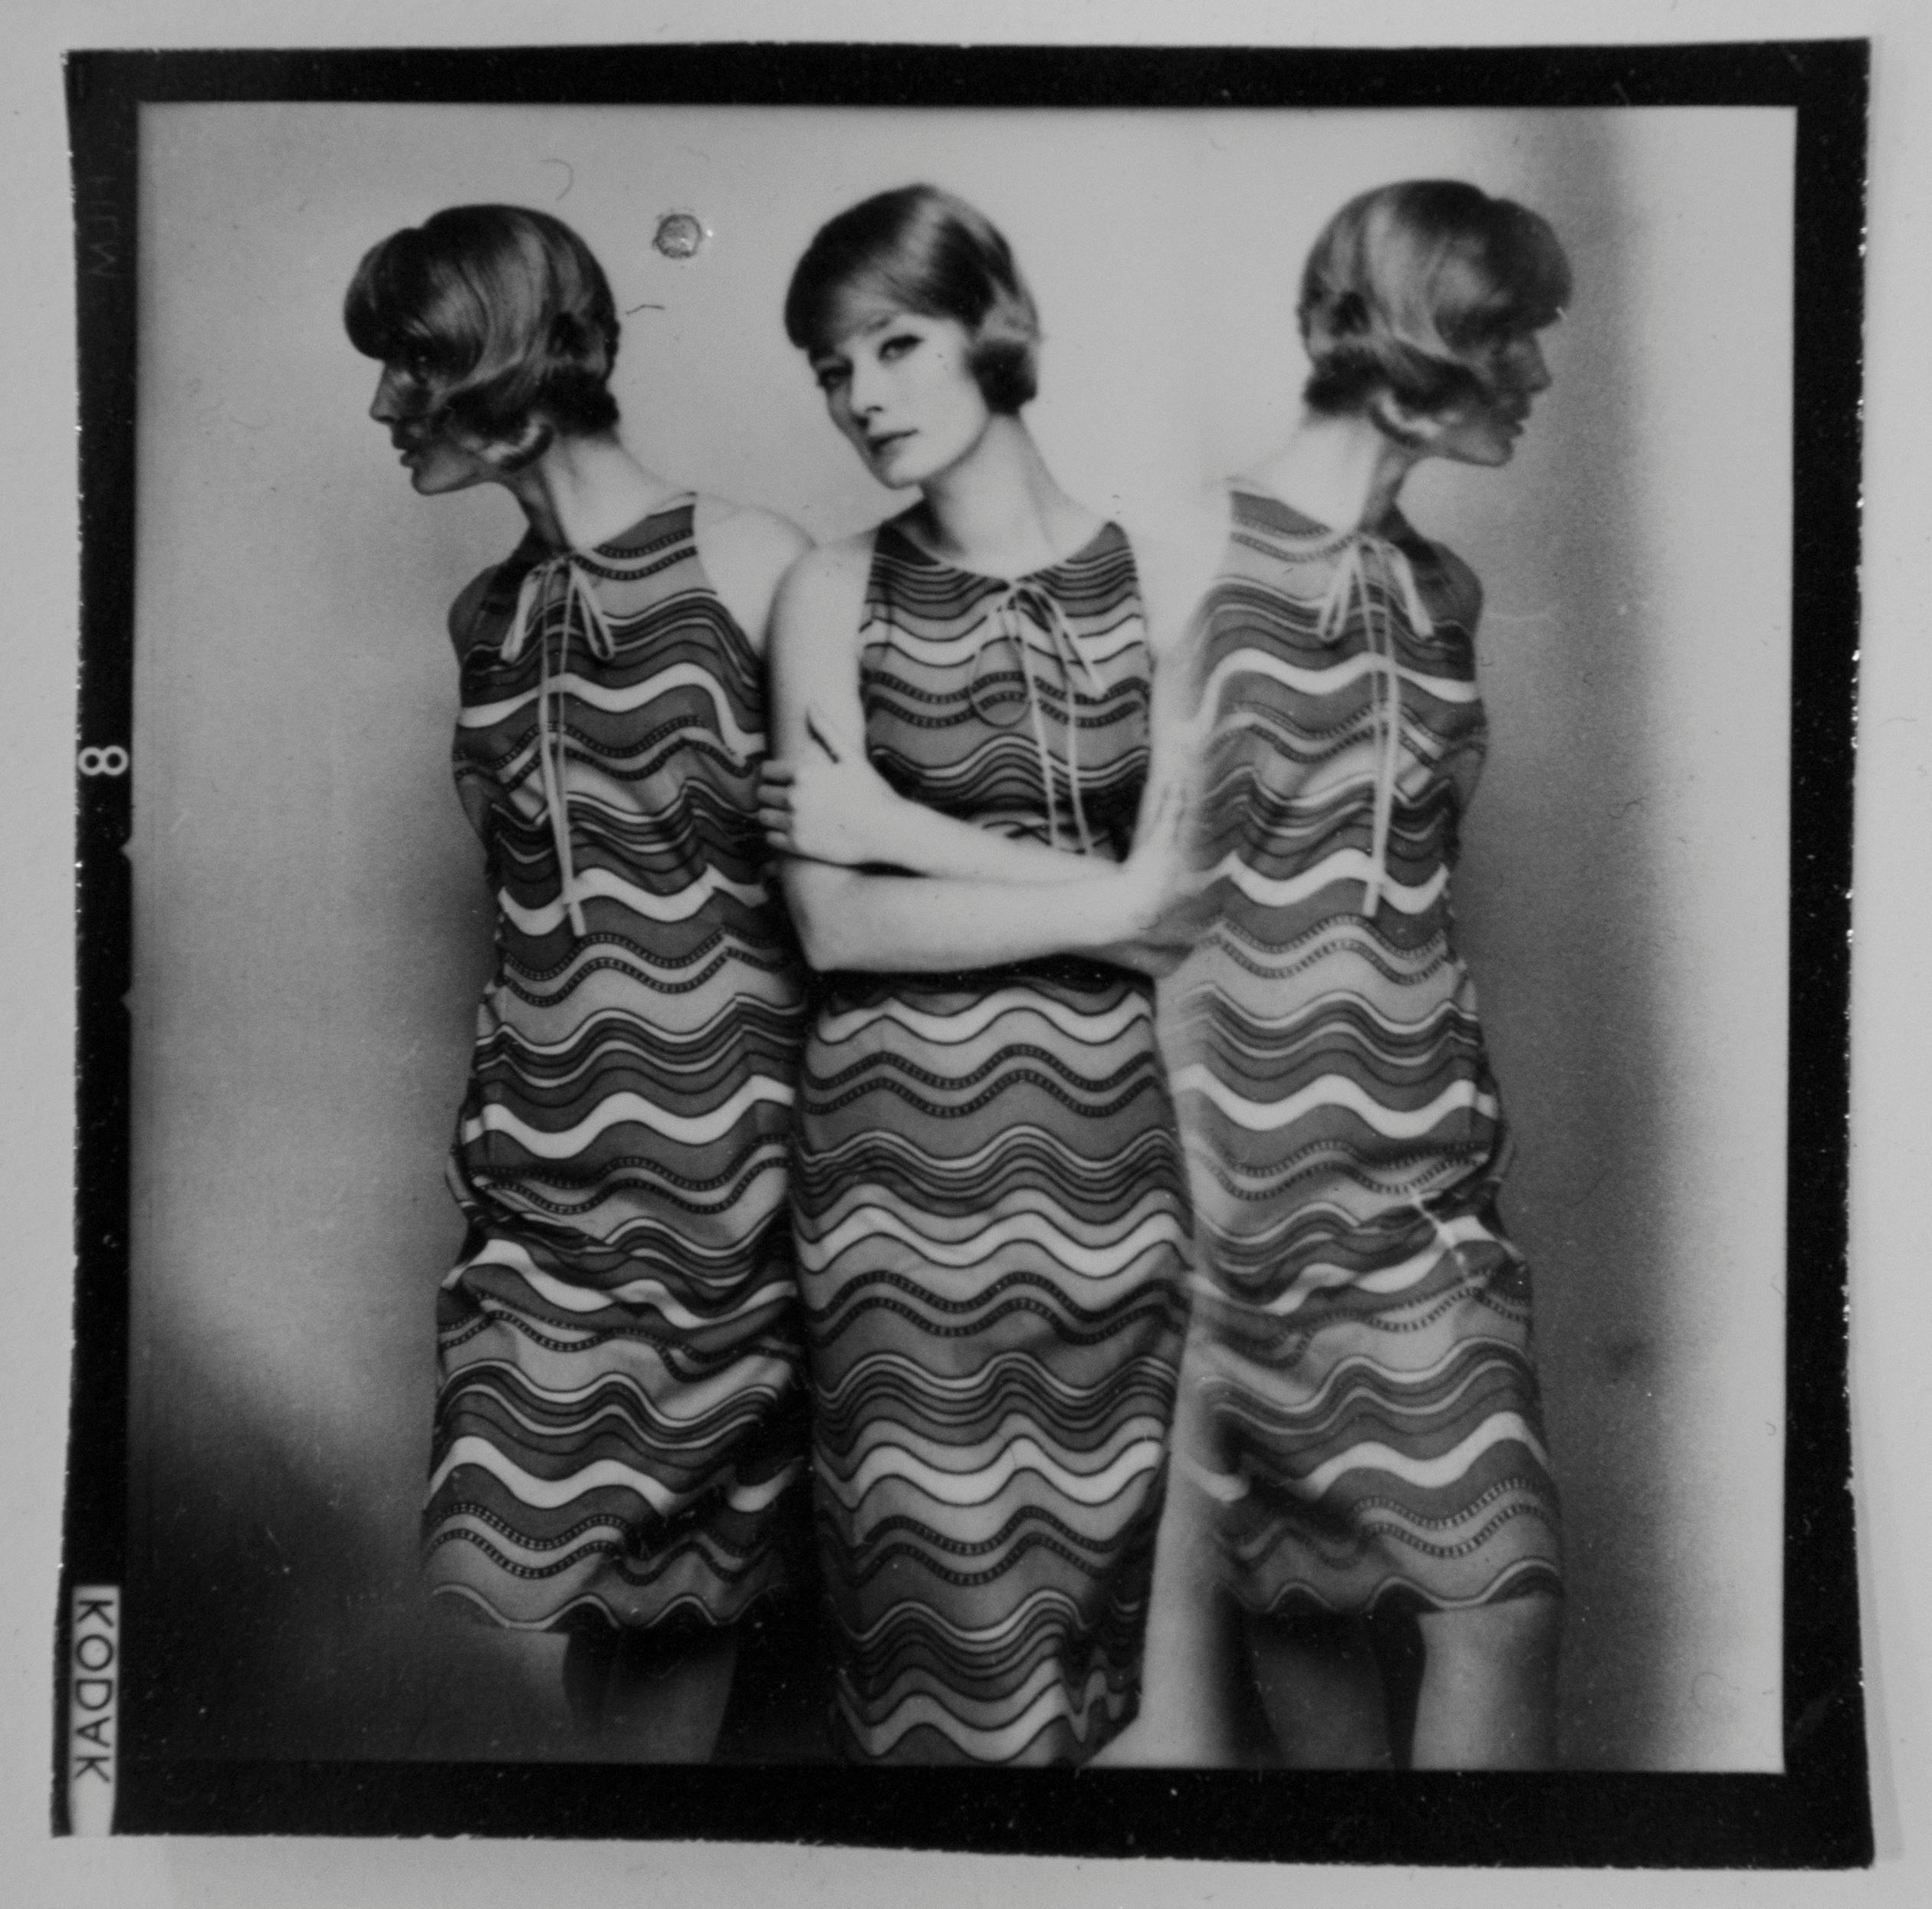 Tania Mallet, Fashion Shoot for Harper's Bazaar, 1 April 1964- Terence Donovan